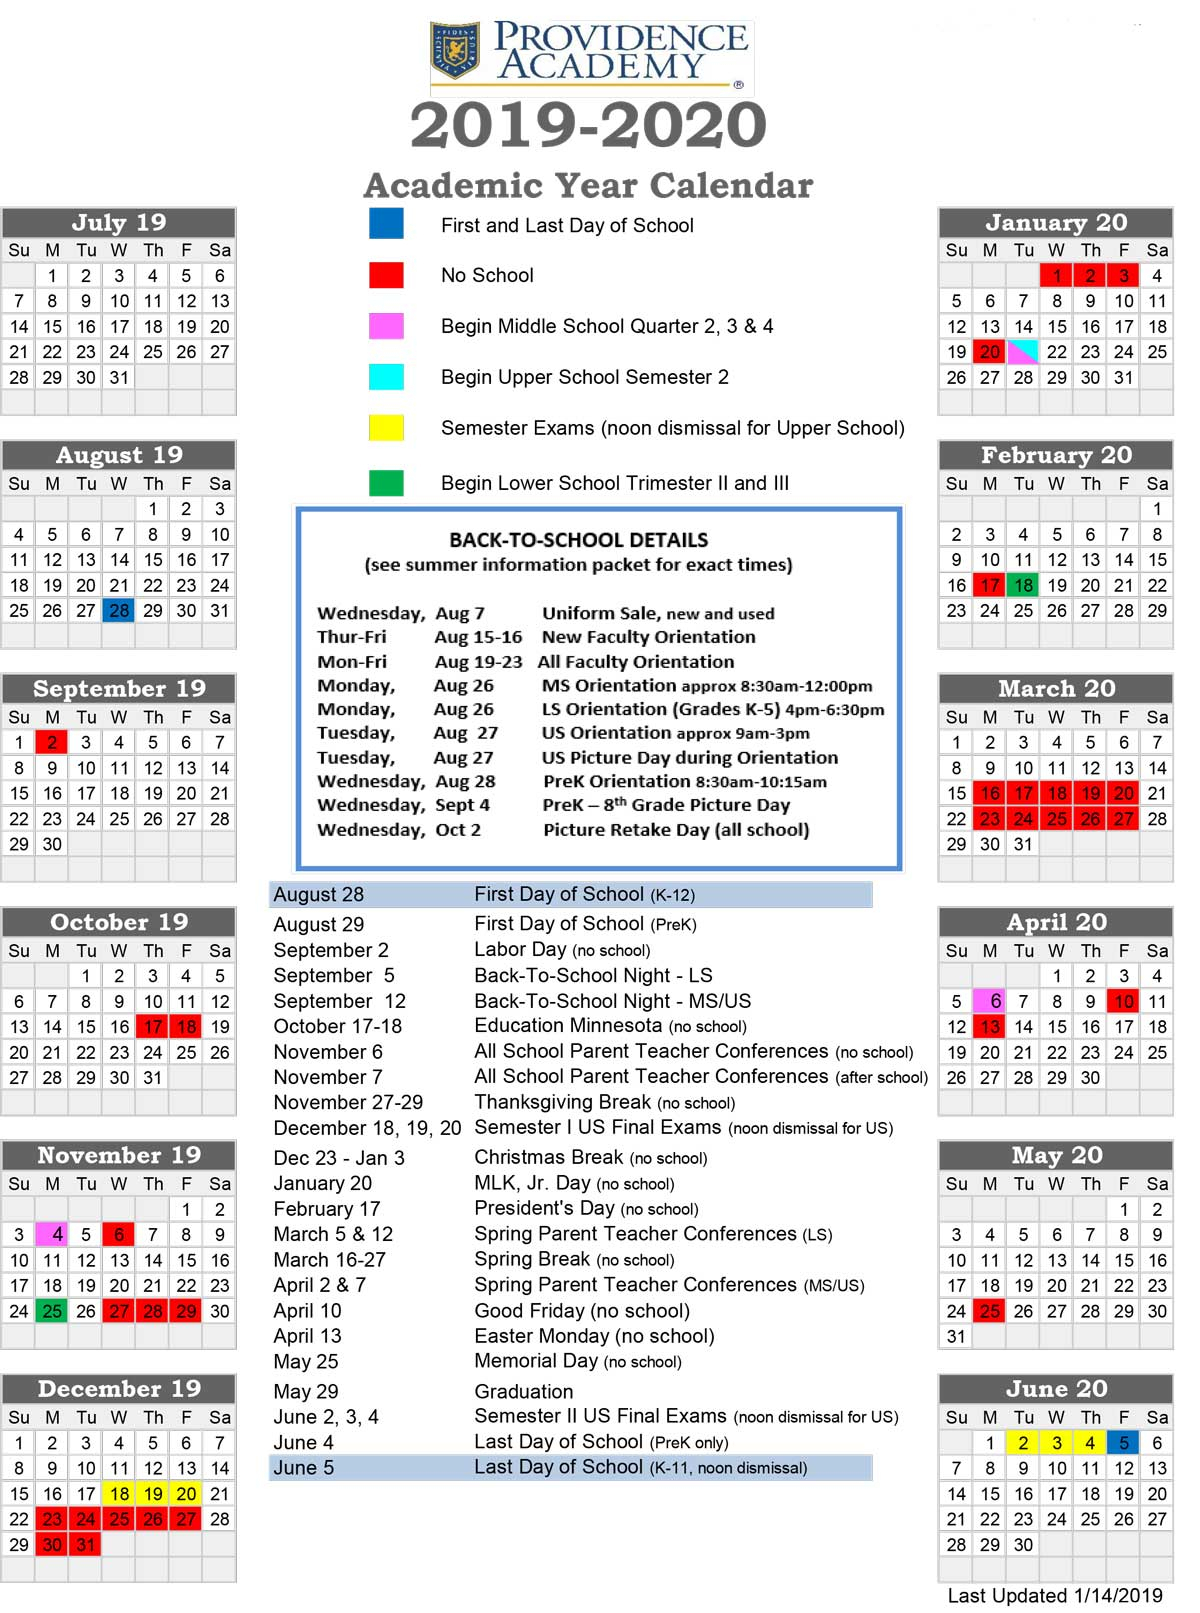 Academic Calendar - Providence Academy for U Of M School Year 2019-2020